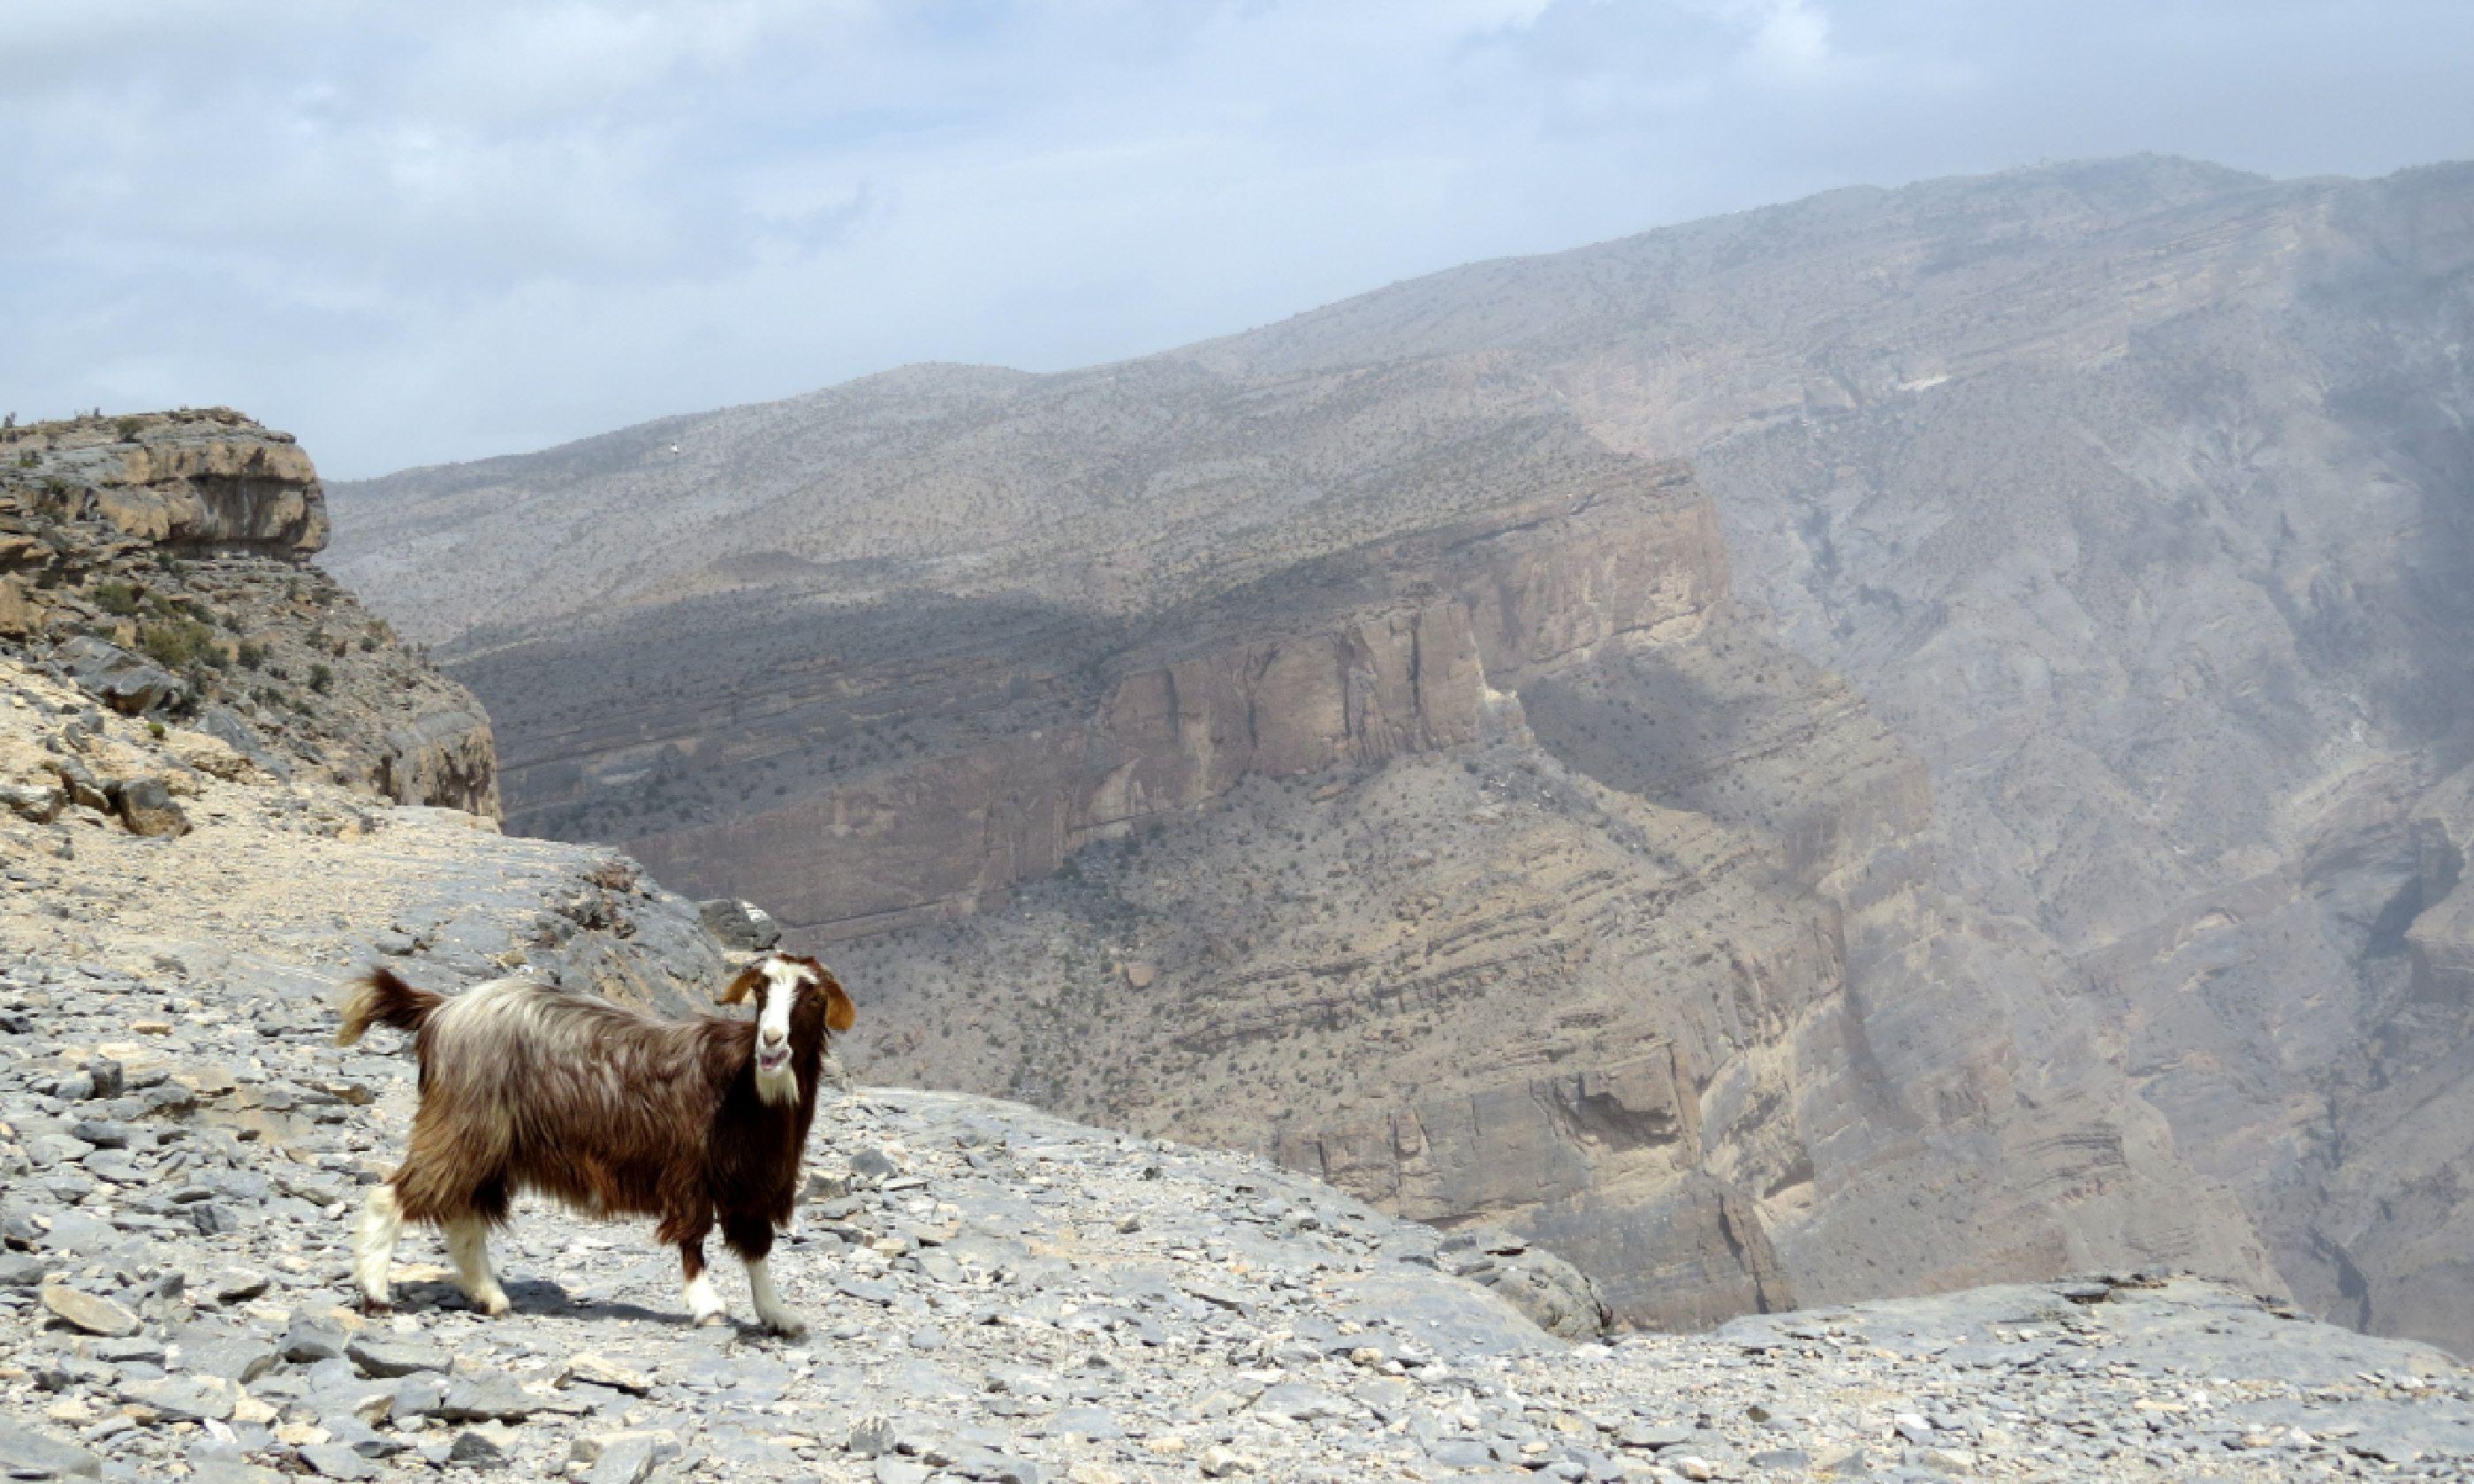 Goat at Jebel Shams (Hazel Plush)